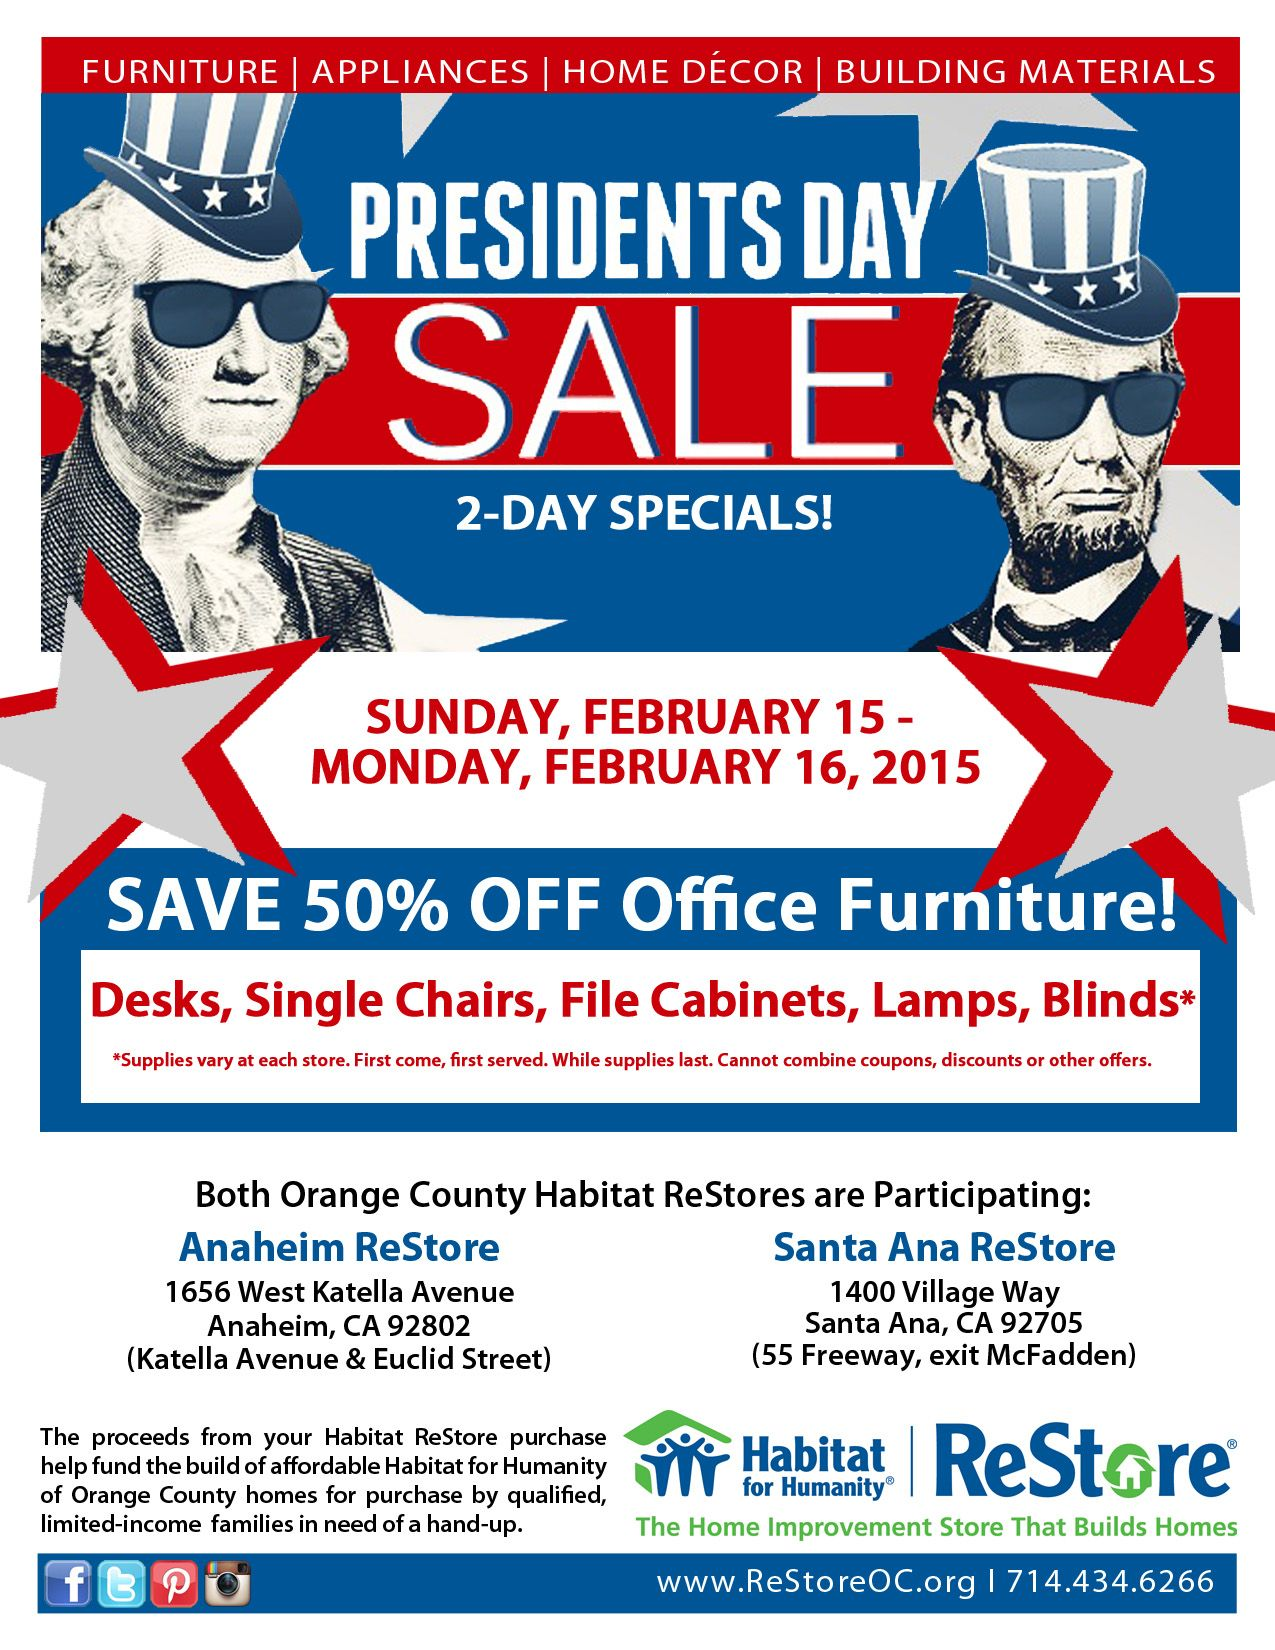 Presidents day sale february 15 16 2015 presidents day sale restores event anaheim restore 1656 west anaheim ave katella euclid santa ana restore